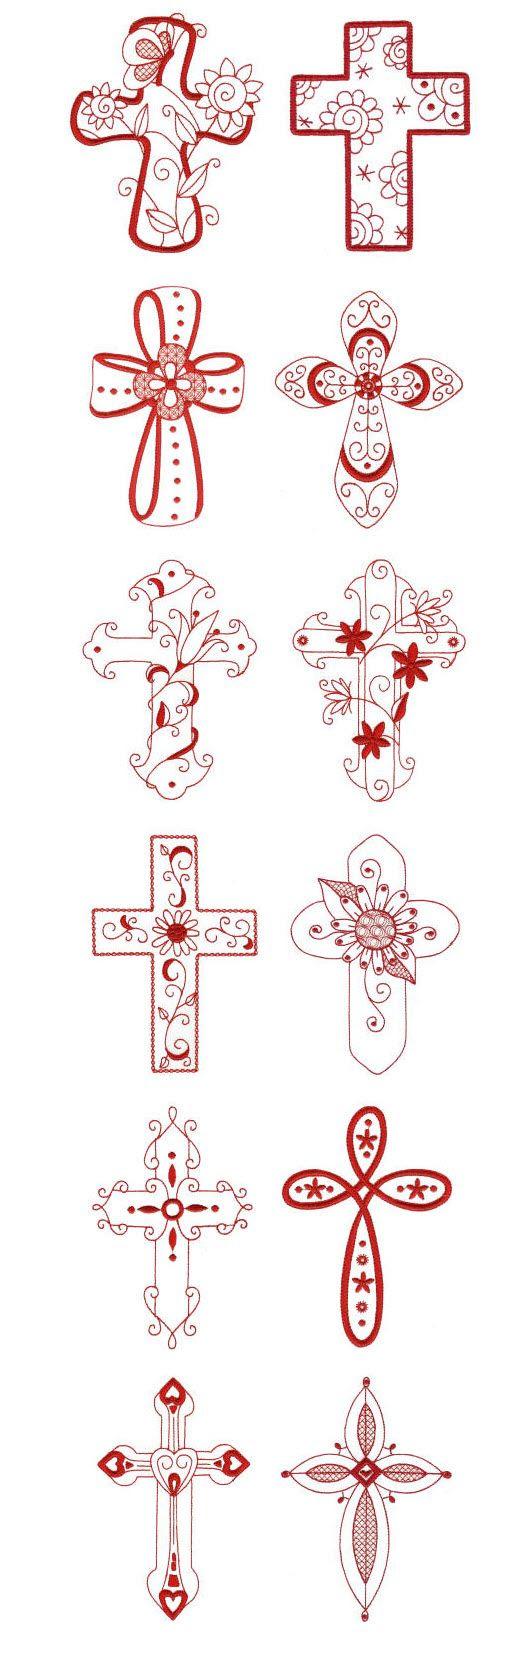 redwork crosses